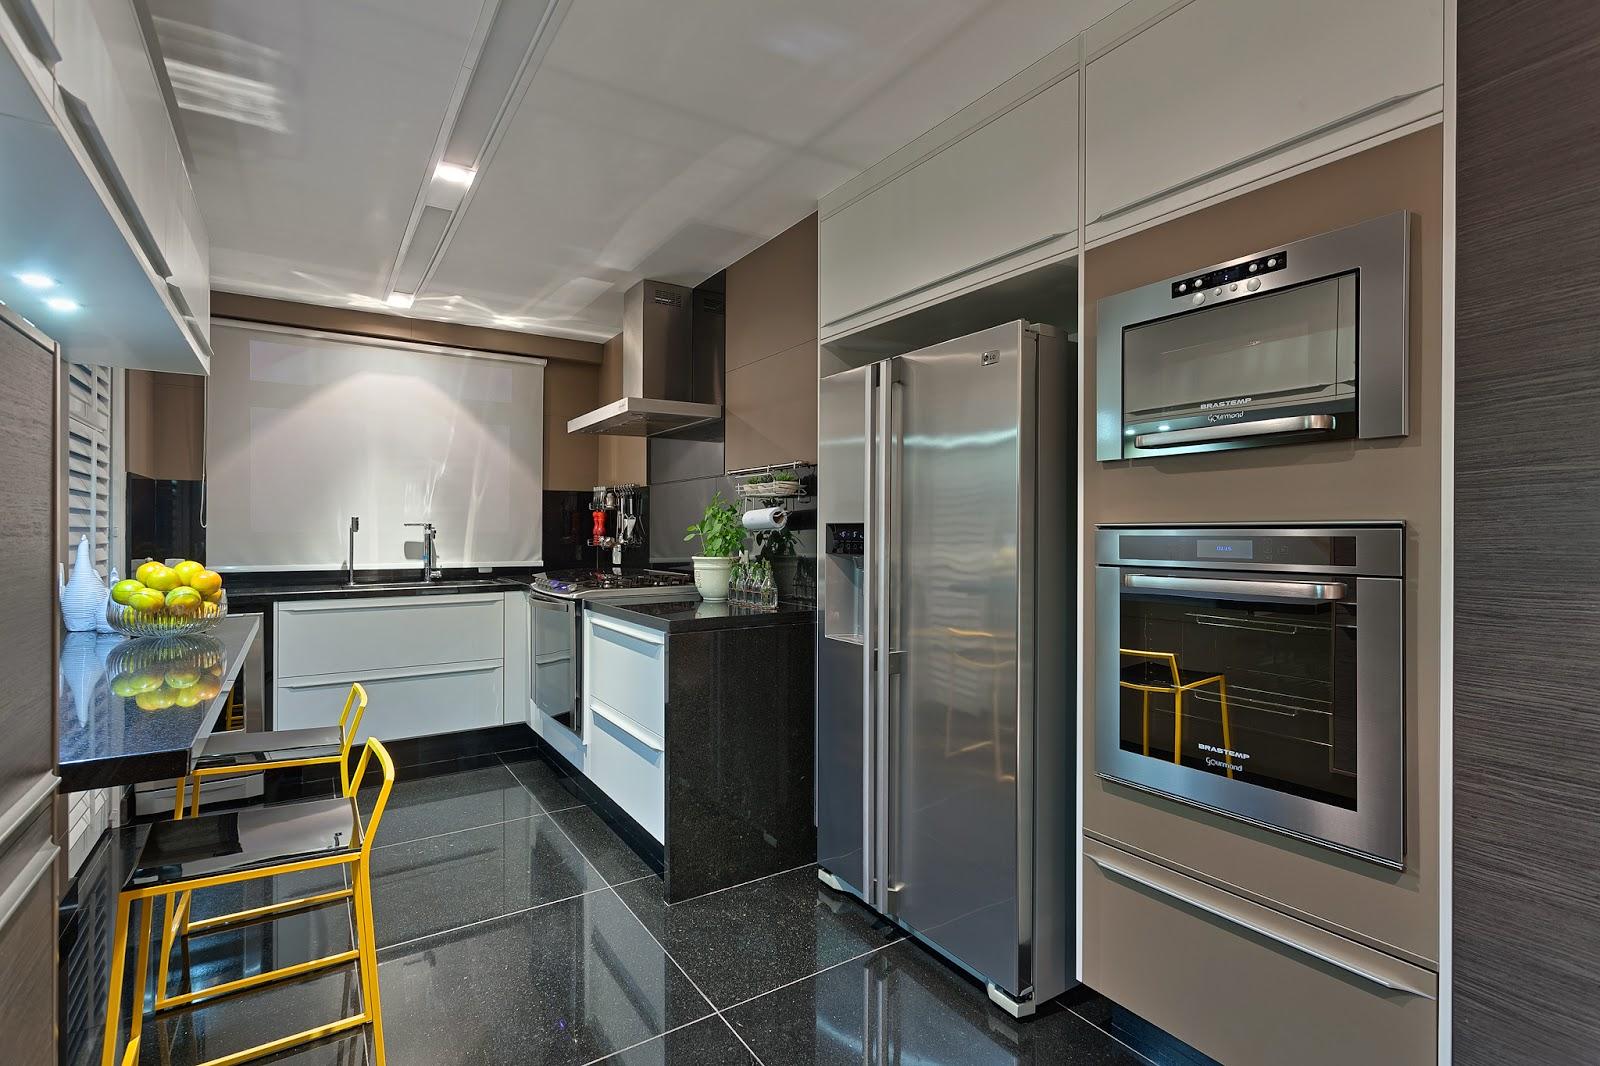 Cozinha tipo corredor com bancada apoiada de granito. Projeto  #4F707C 1600 1066